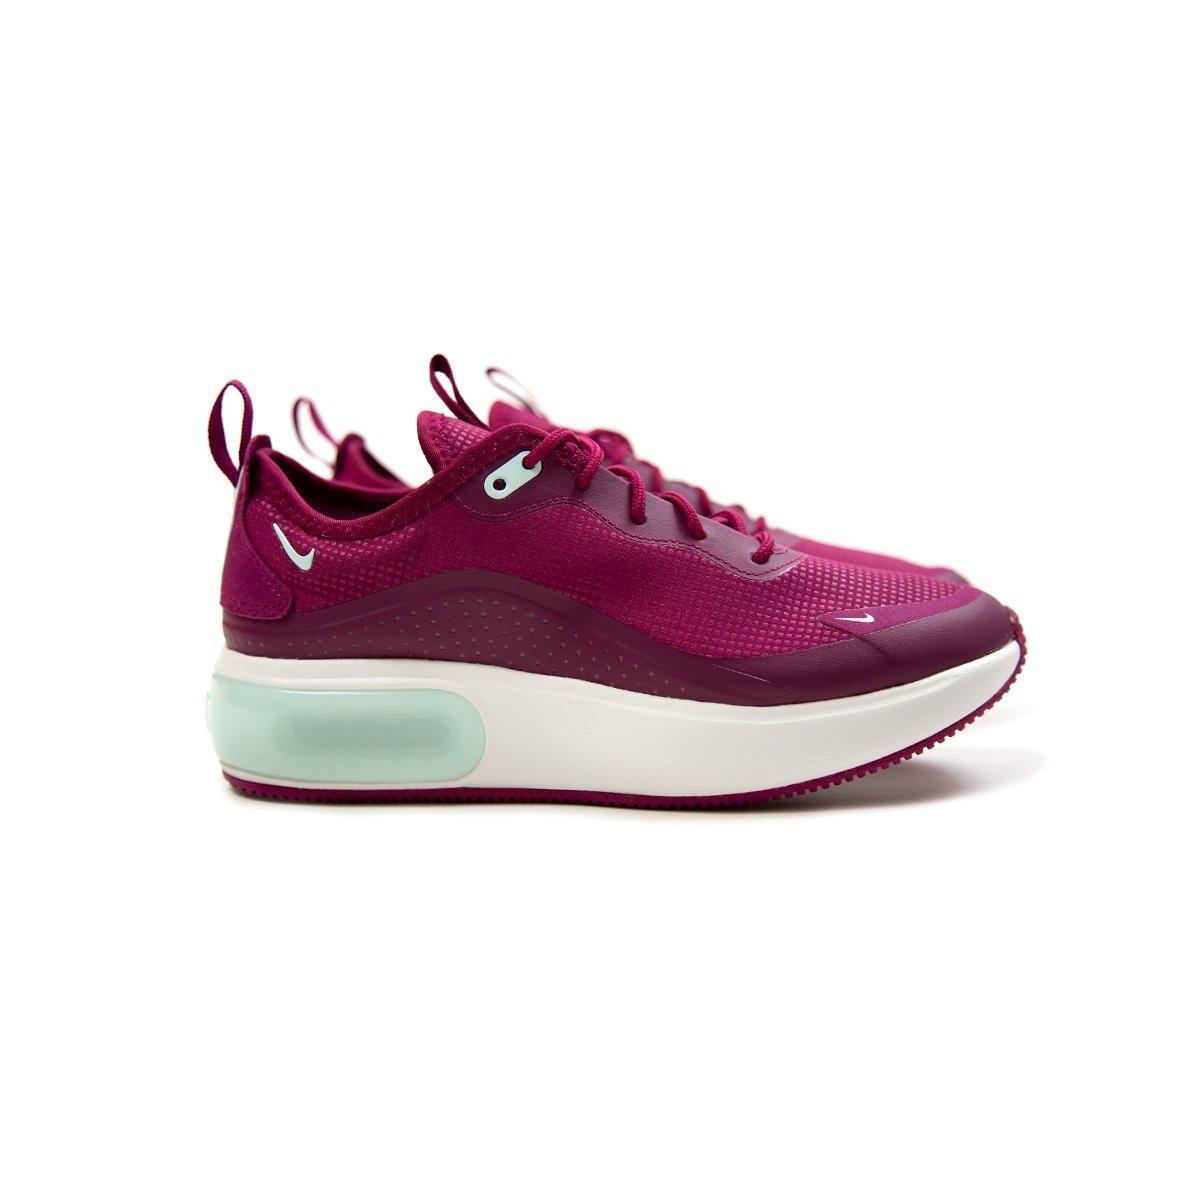 da89a2a0e1c zapatillas nike wmns air max dia berry white mujer original. Cargando zoom.